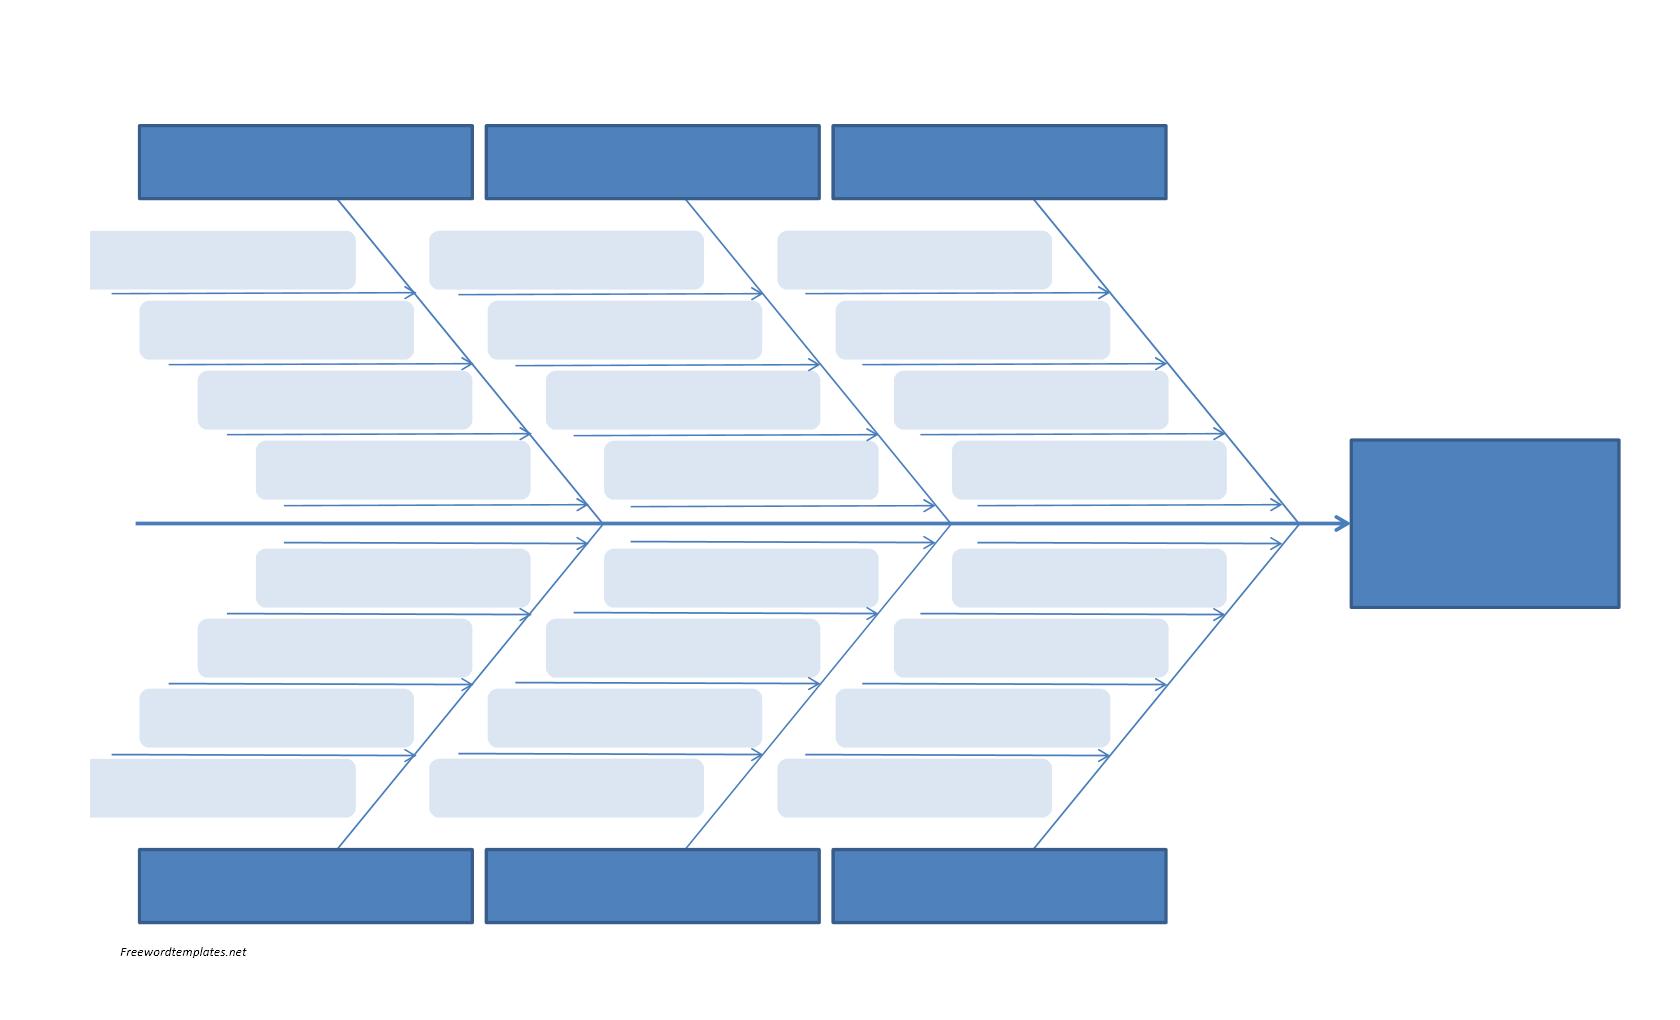 hight resolution of fishbone diagram freewordtemplates net